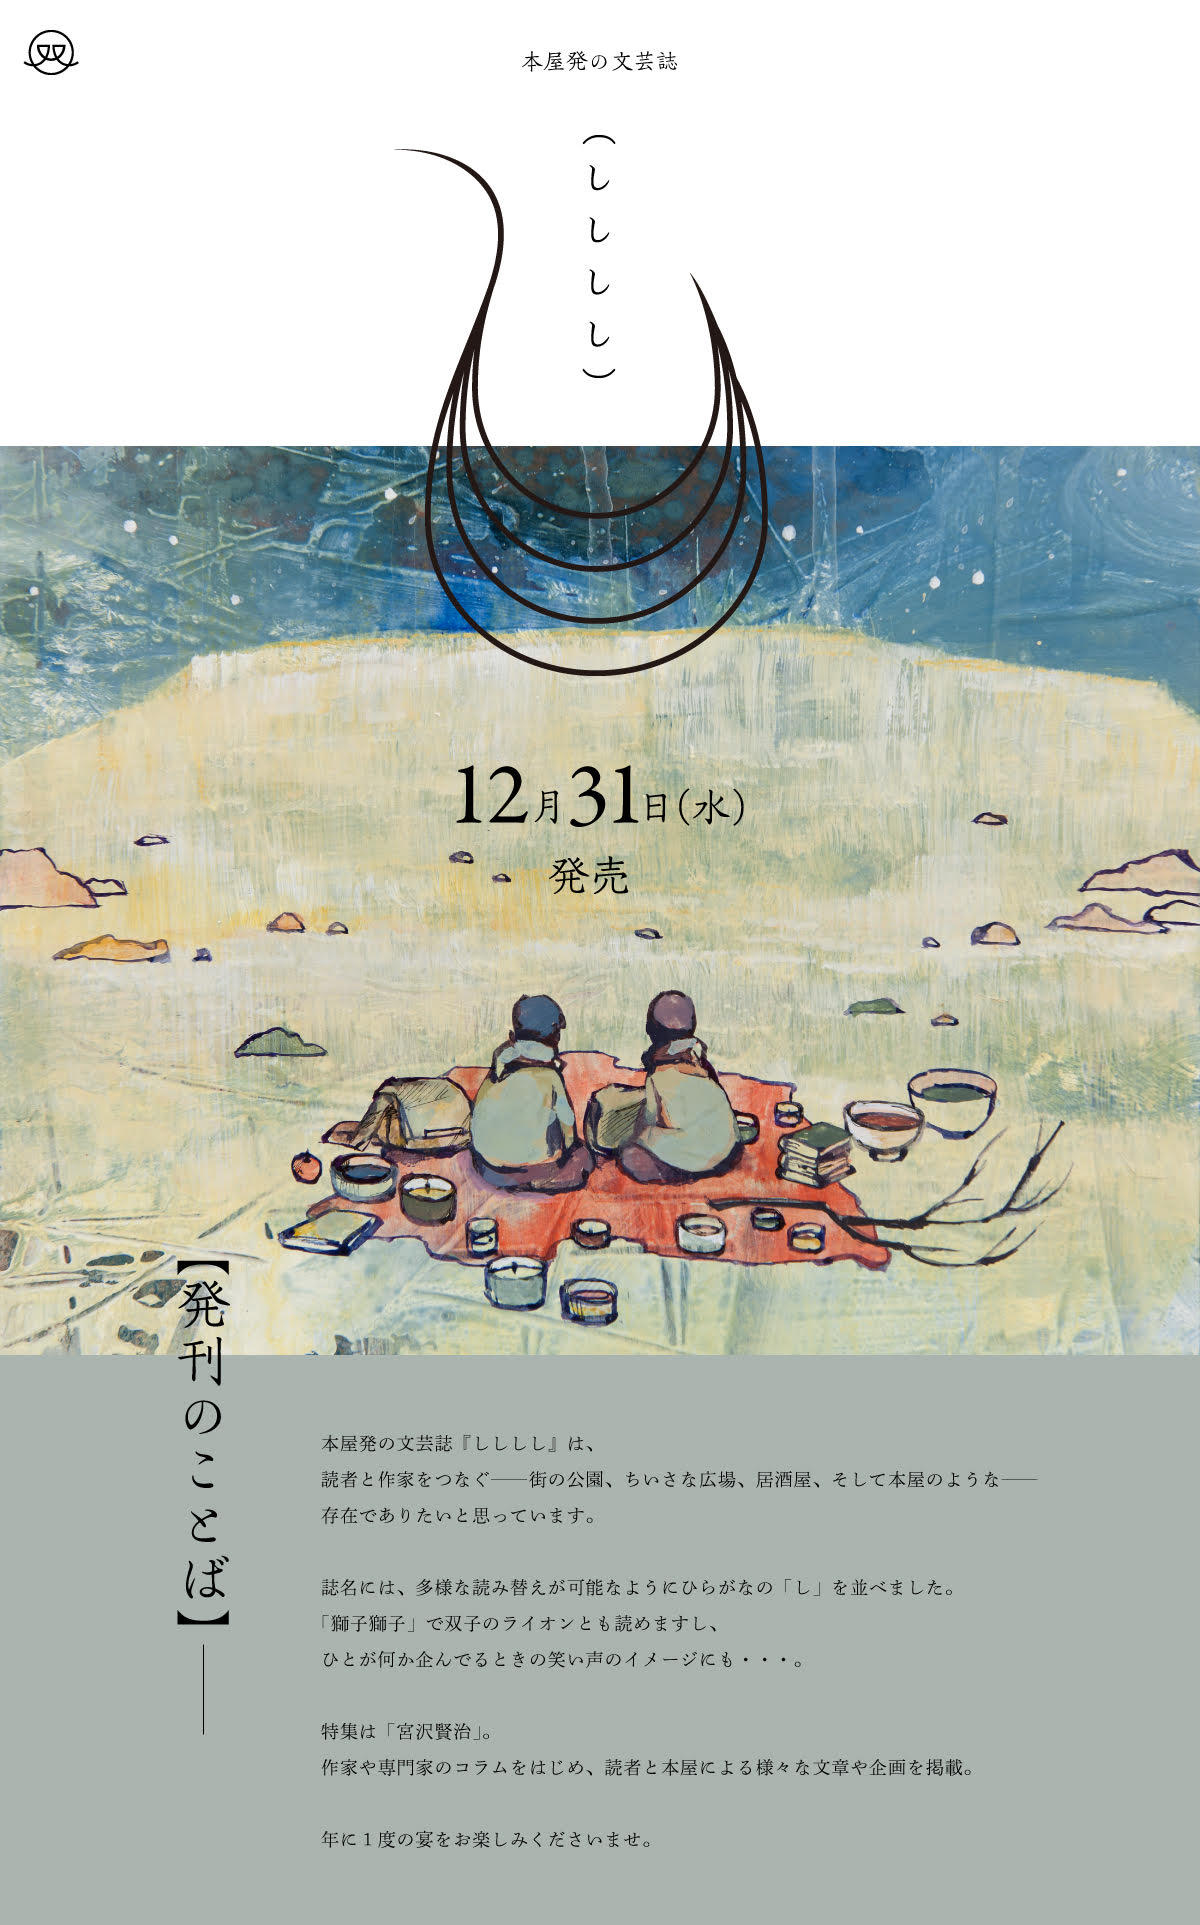 http://shishishishi.liondo.jp/wp-content/uploads/2017/10/unnamed-1.jpg